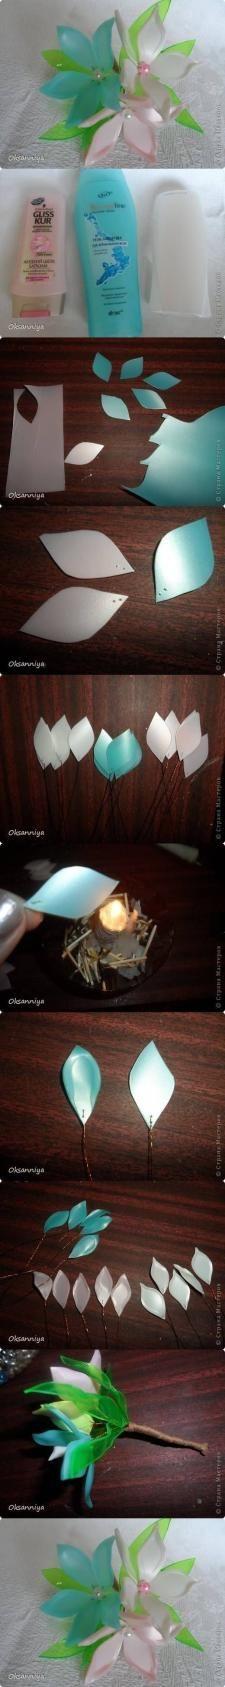 Jewelry Craft Ideas - Pandahall.com plastic bottle flowers repurpose recycle green